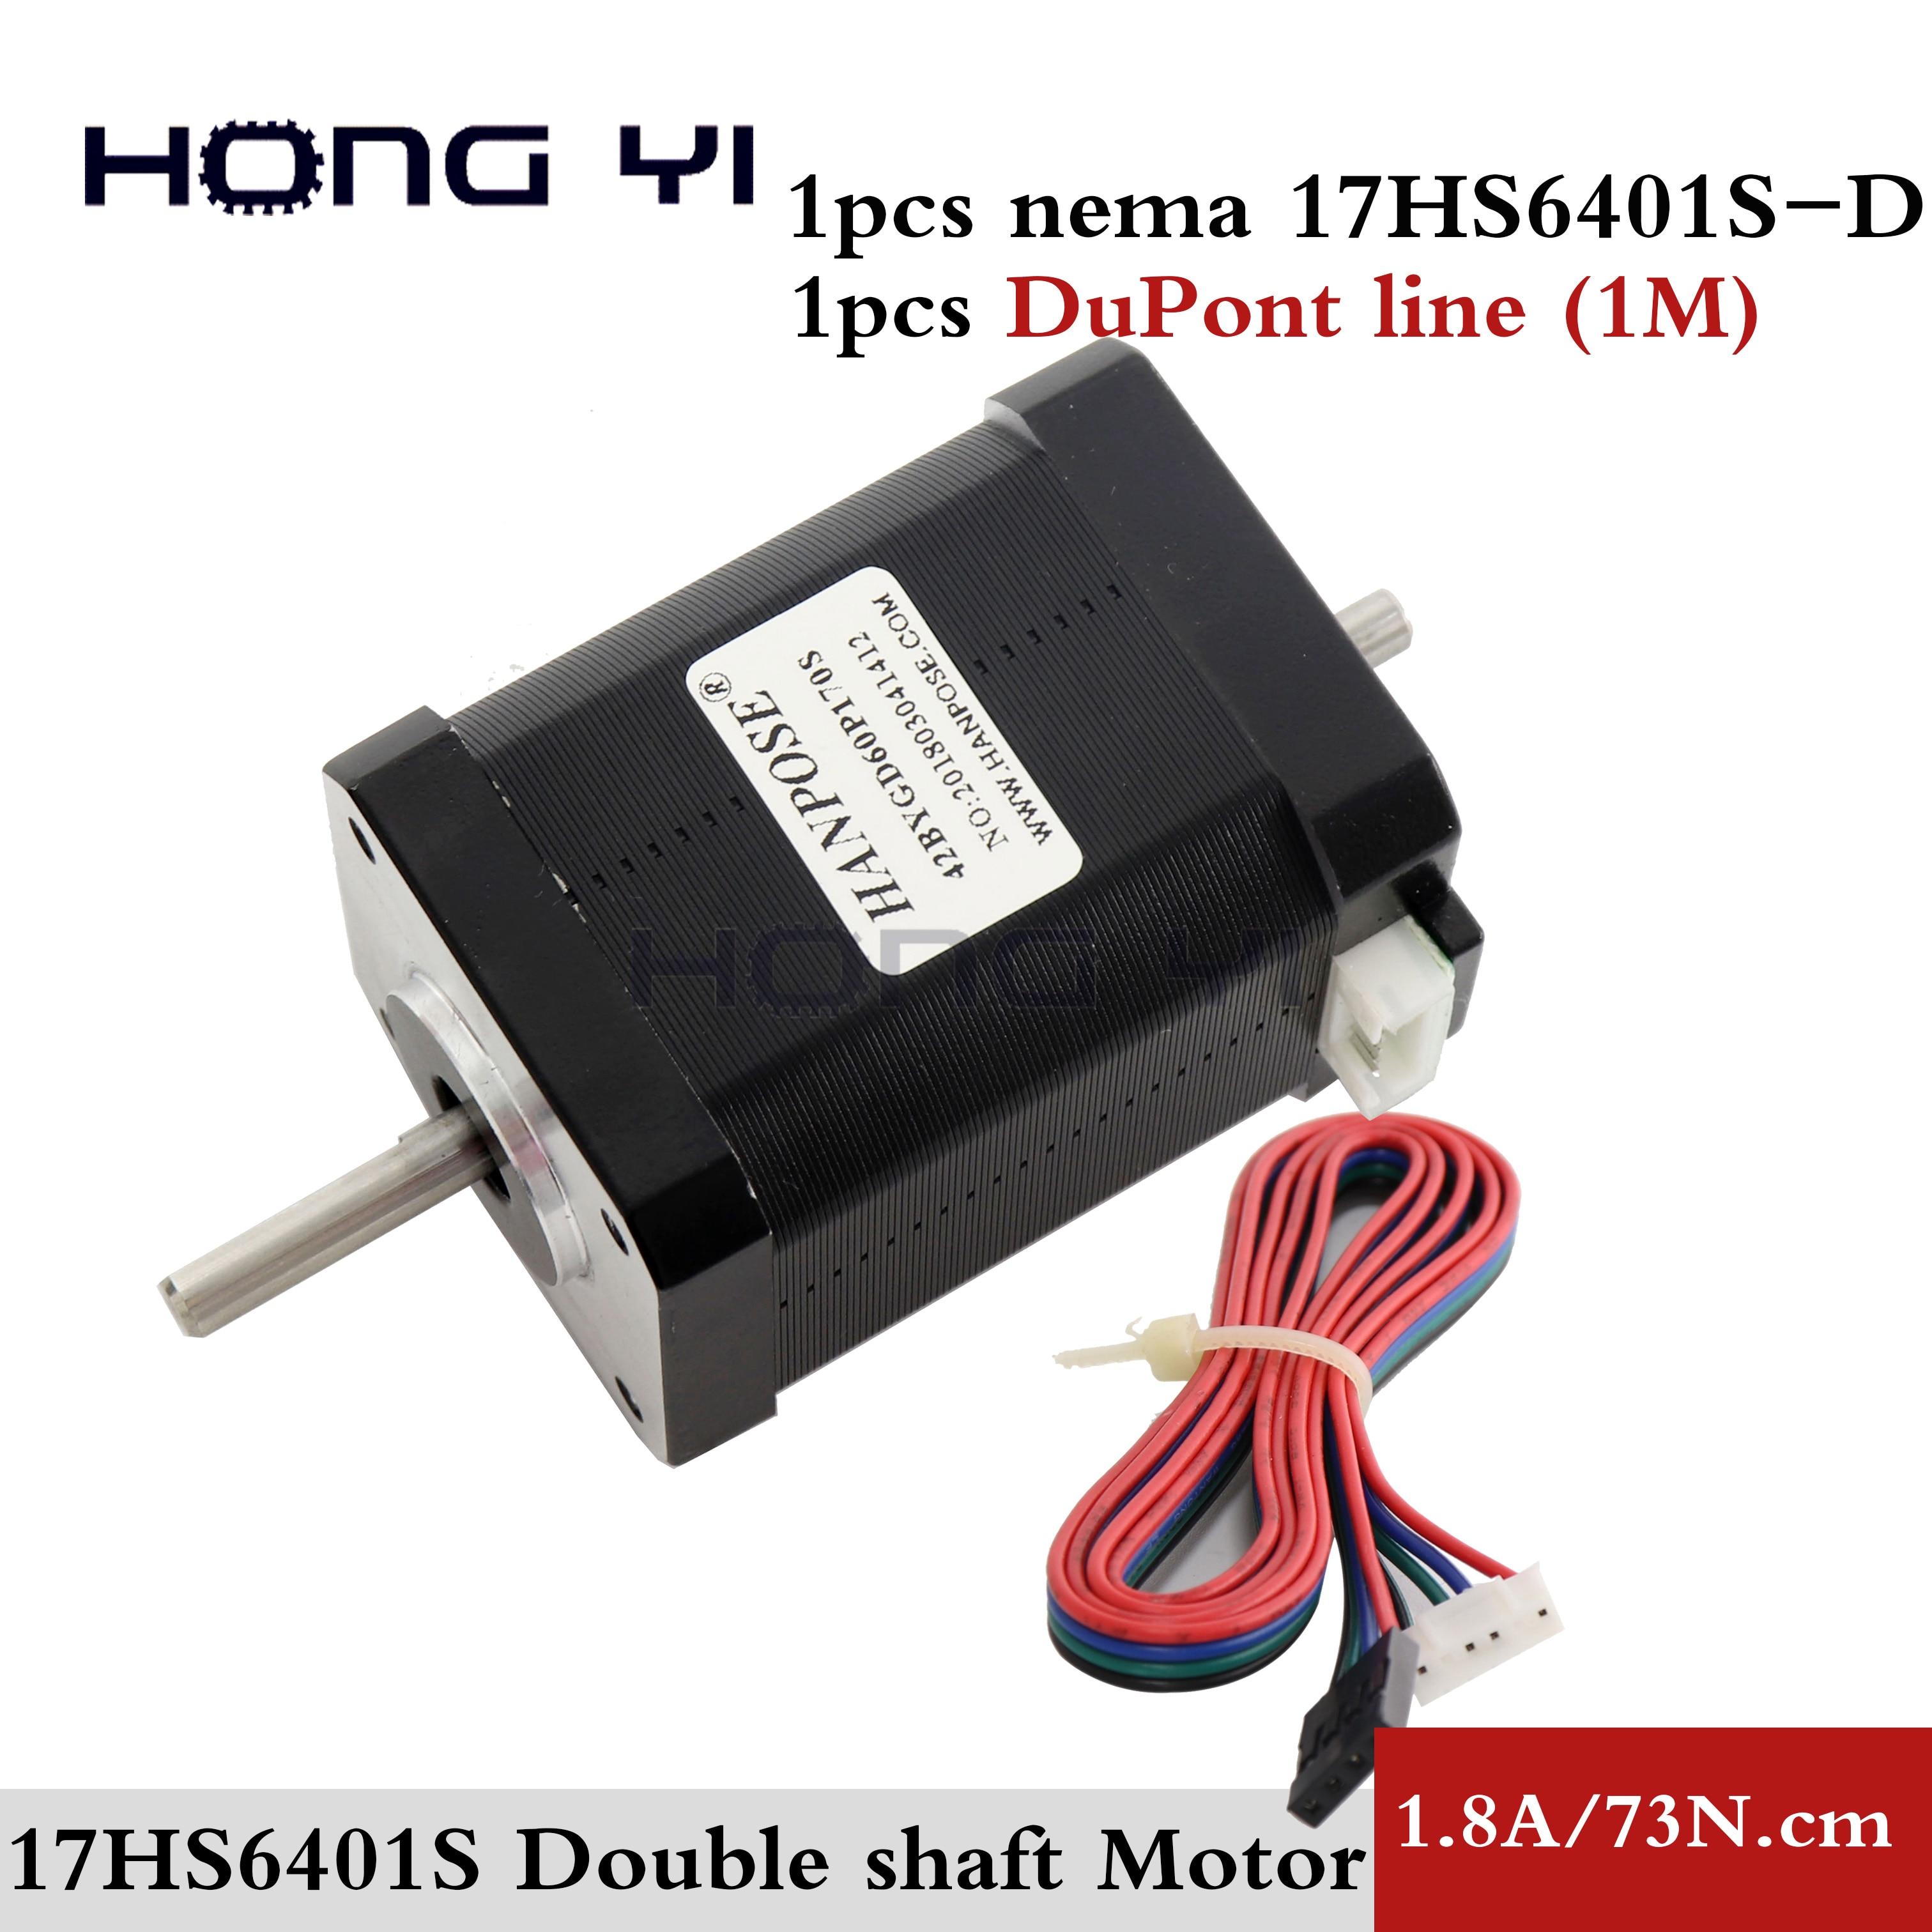 Free shipping hybrid stepper motor nema 17 motor 60mm (1.7A, 0.73NM, 60mm, 4 wire) 17HS6401S for 3D printer cncStepper Motor   -